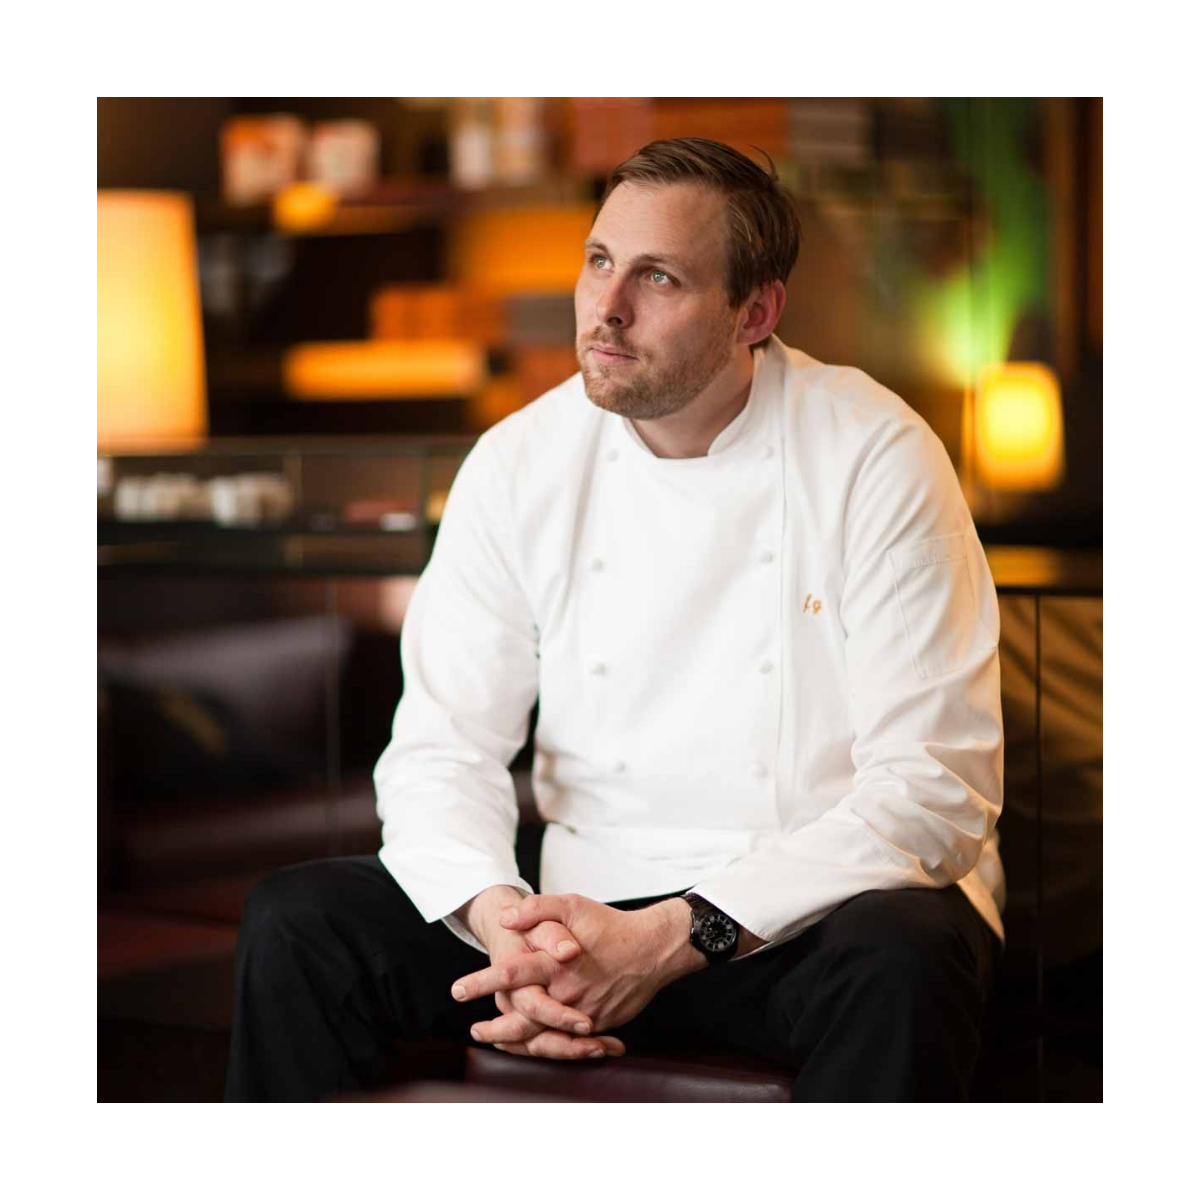 Florian Glauert vom Restaurant Duke Berlin